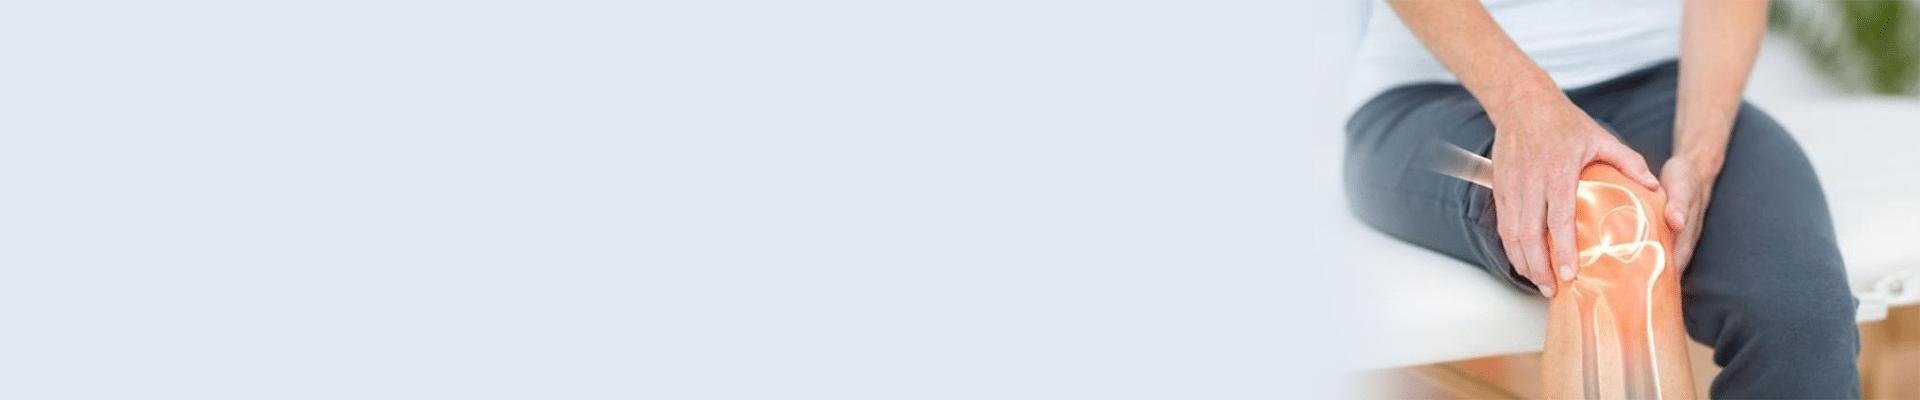 [:fr]Chirurgie orthopédique : Prothèse totale du genou à Nabeul[:ar]جراحة العظام : التغيير الكلي للركبة في نابل[:]